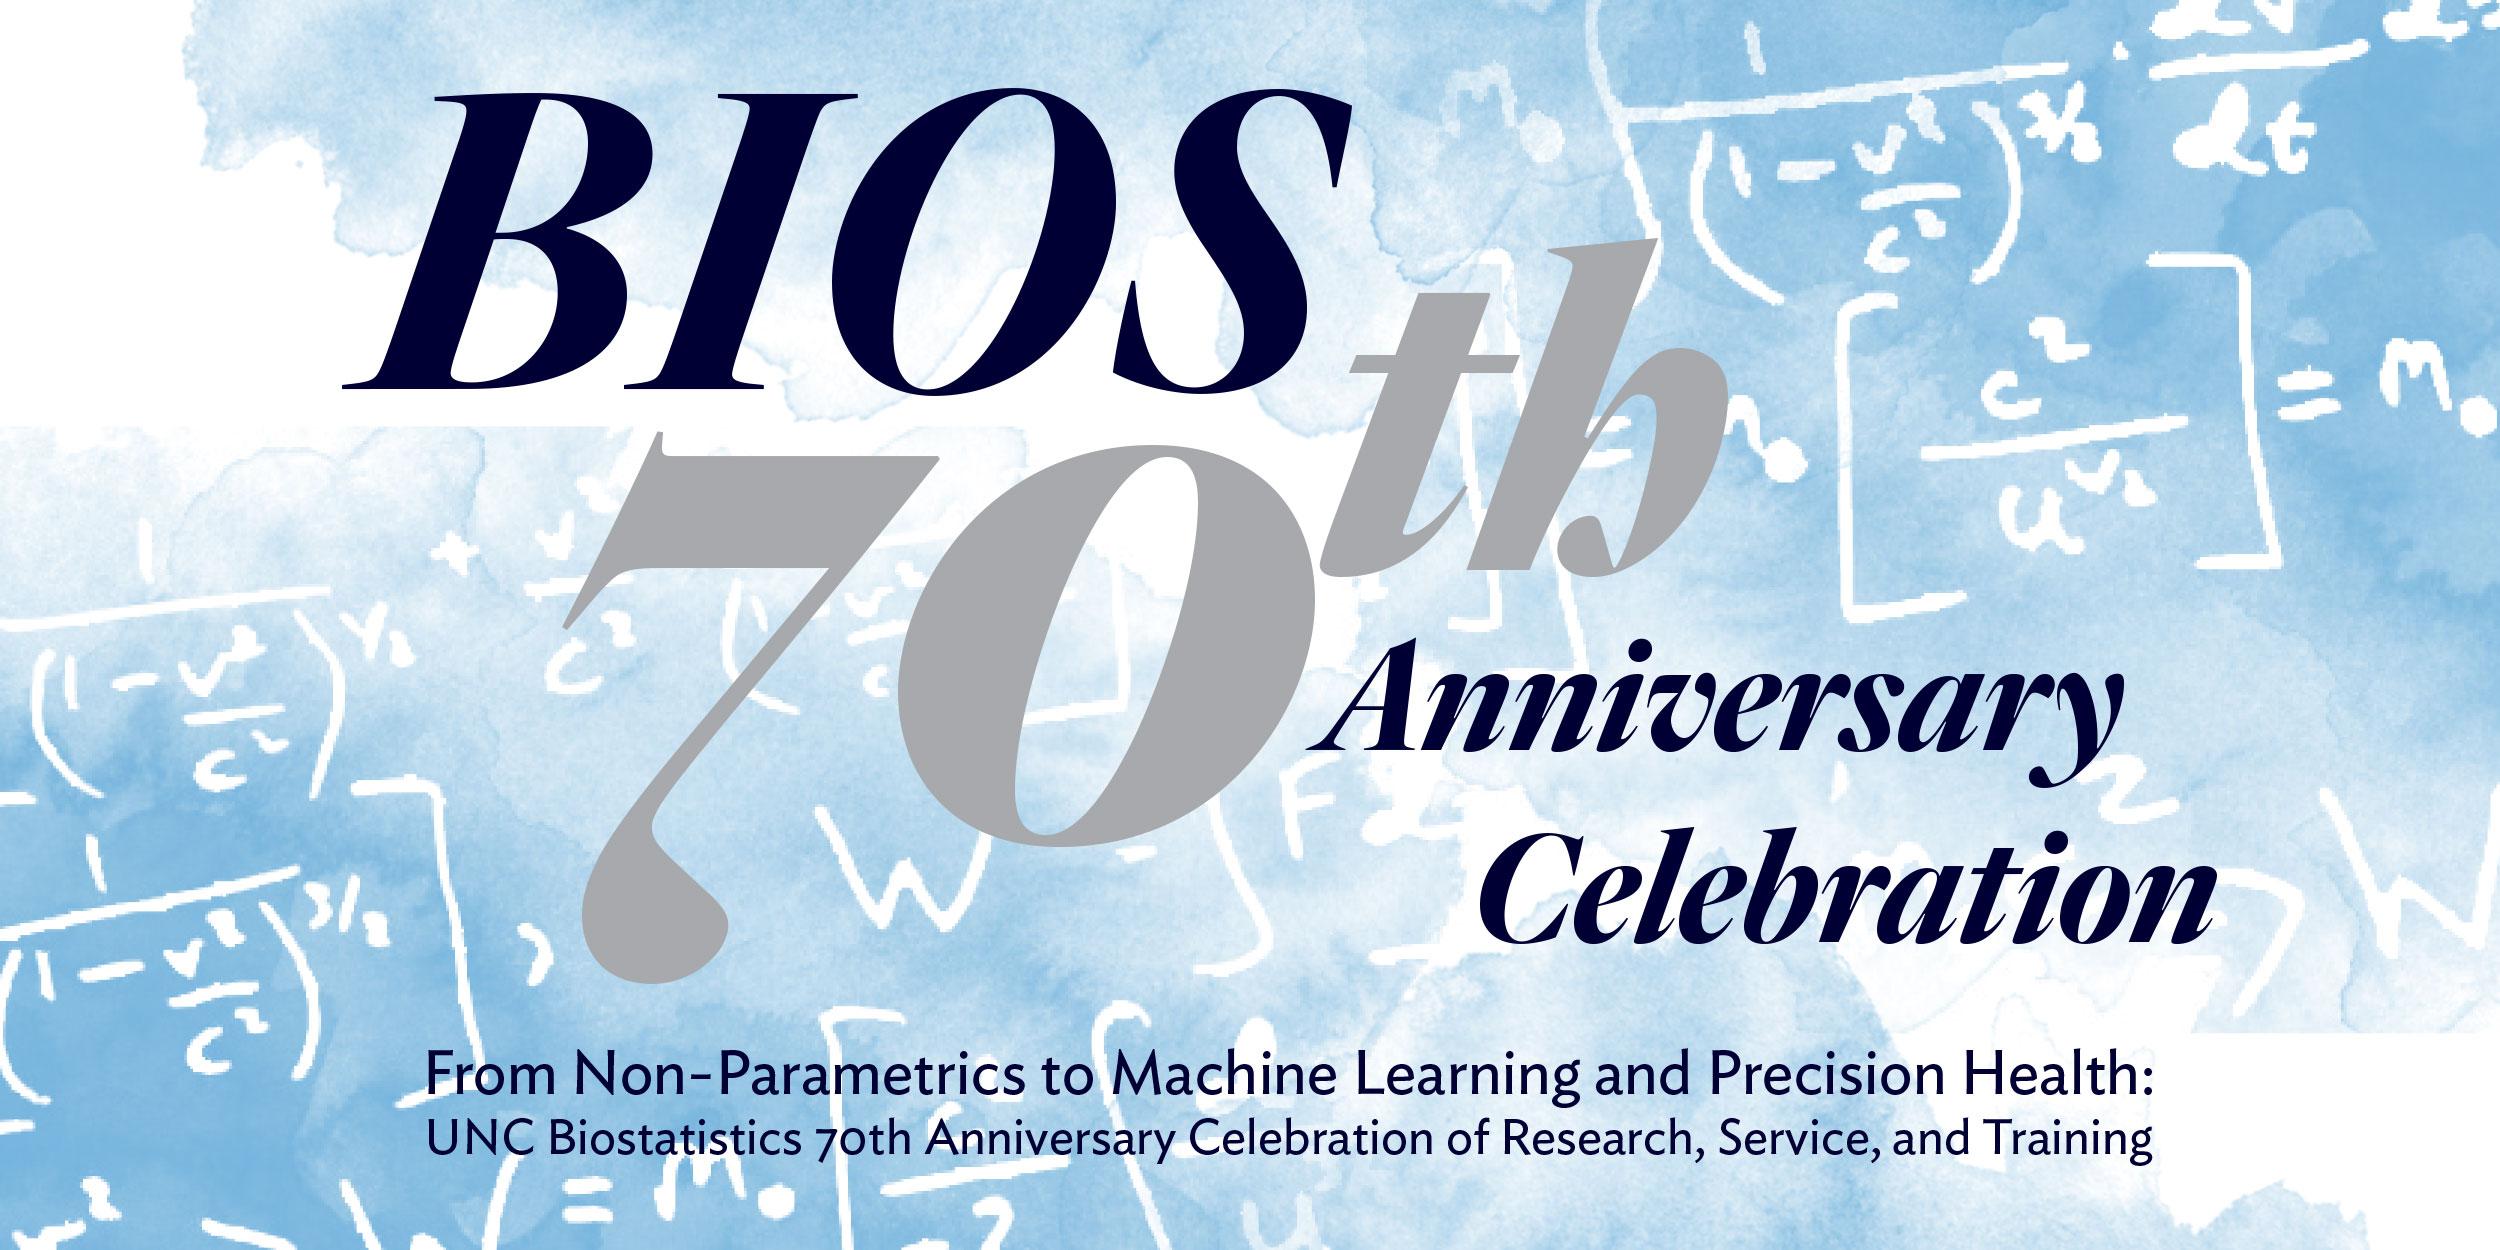 Department of Biostatistics 70th Anniversary Celebration